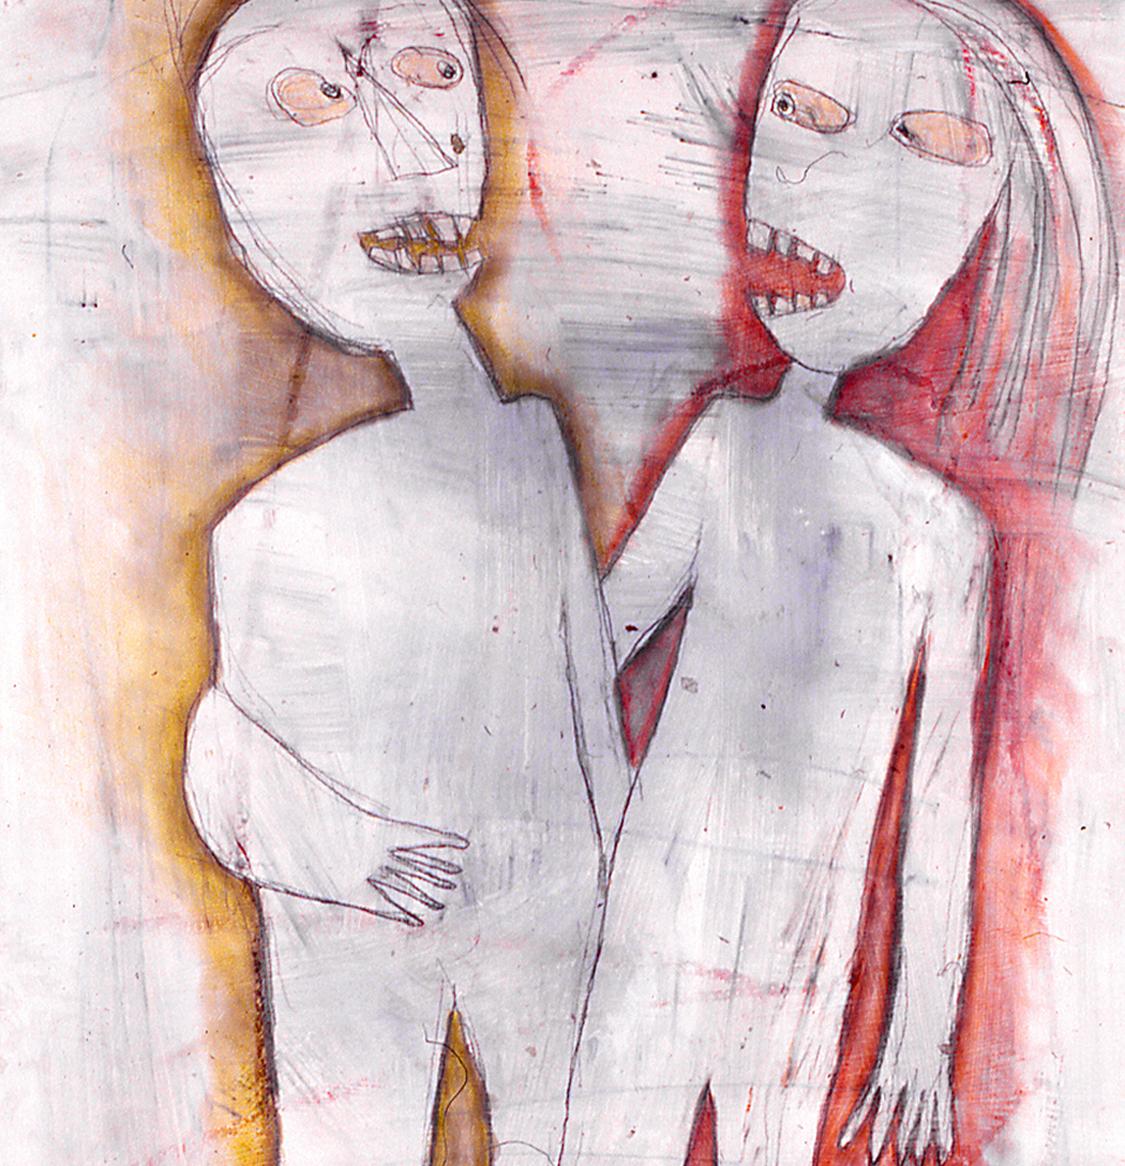 Friends (detail). 2002. Pastel, graphite. 42x26 inches.